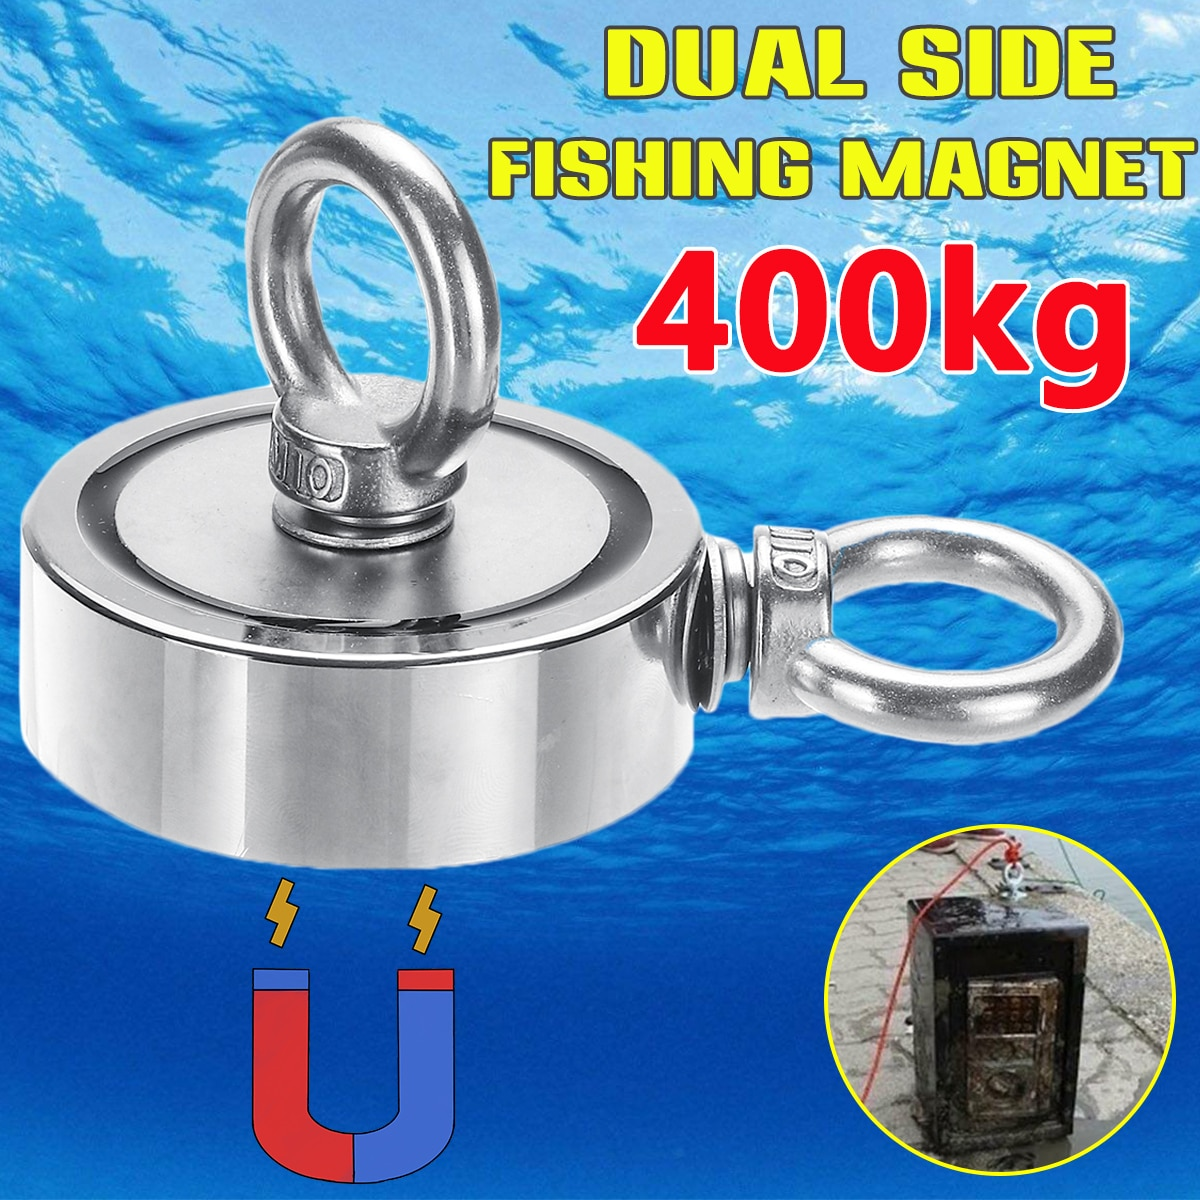 400kg/250kg/150kg imán de neodimio fuerte gancho redondo imán de salvamento pesca en aguas profundas soporte magnético de caza del tesoro